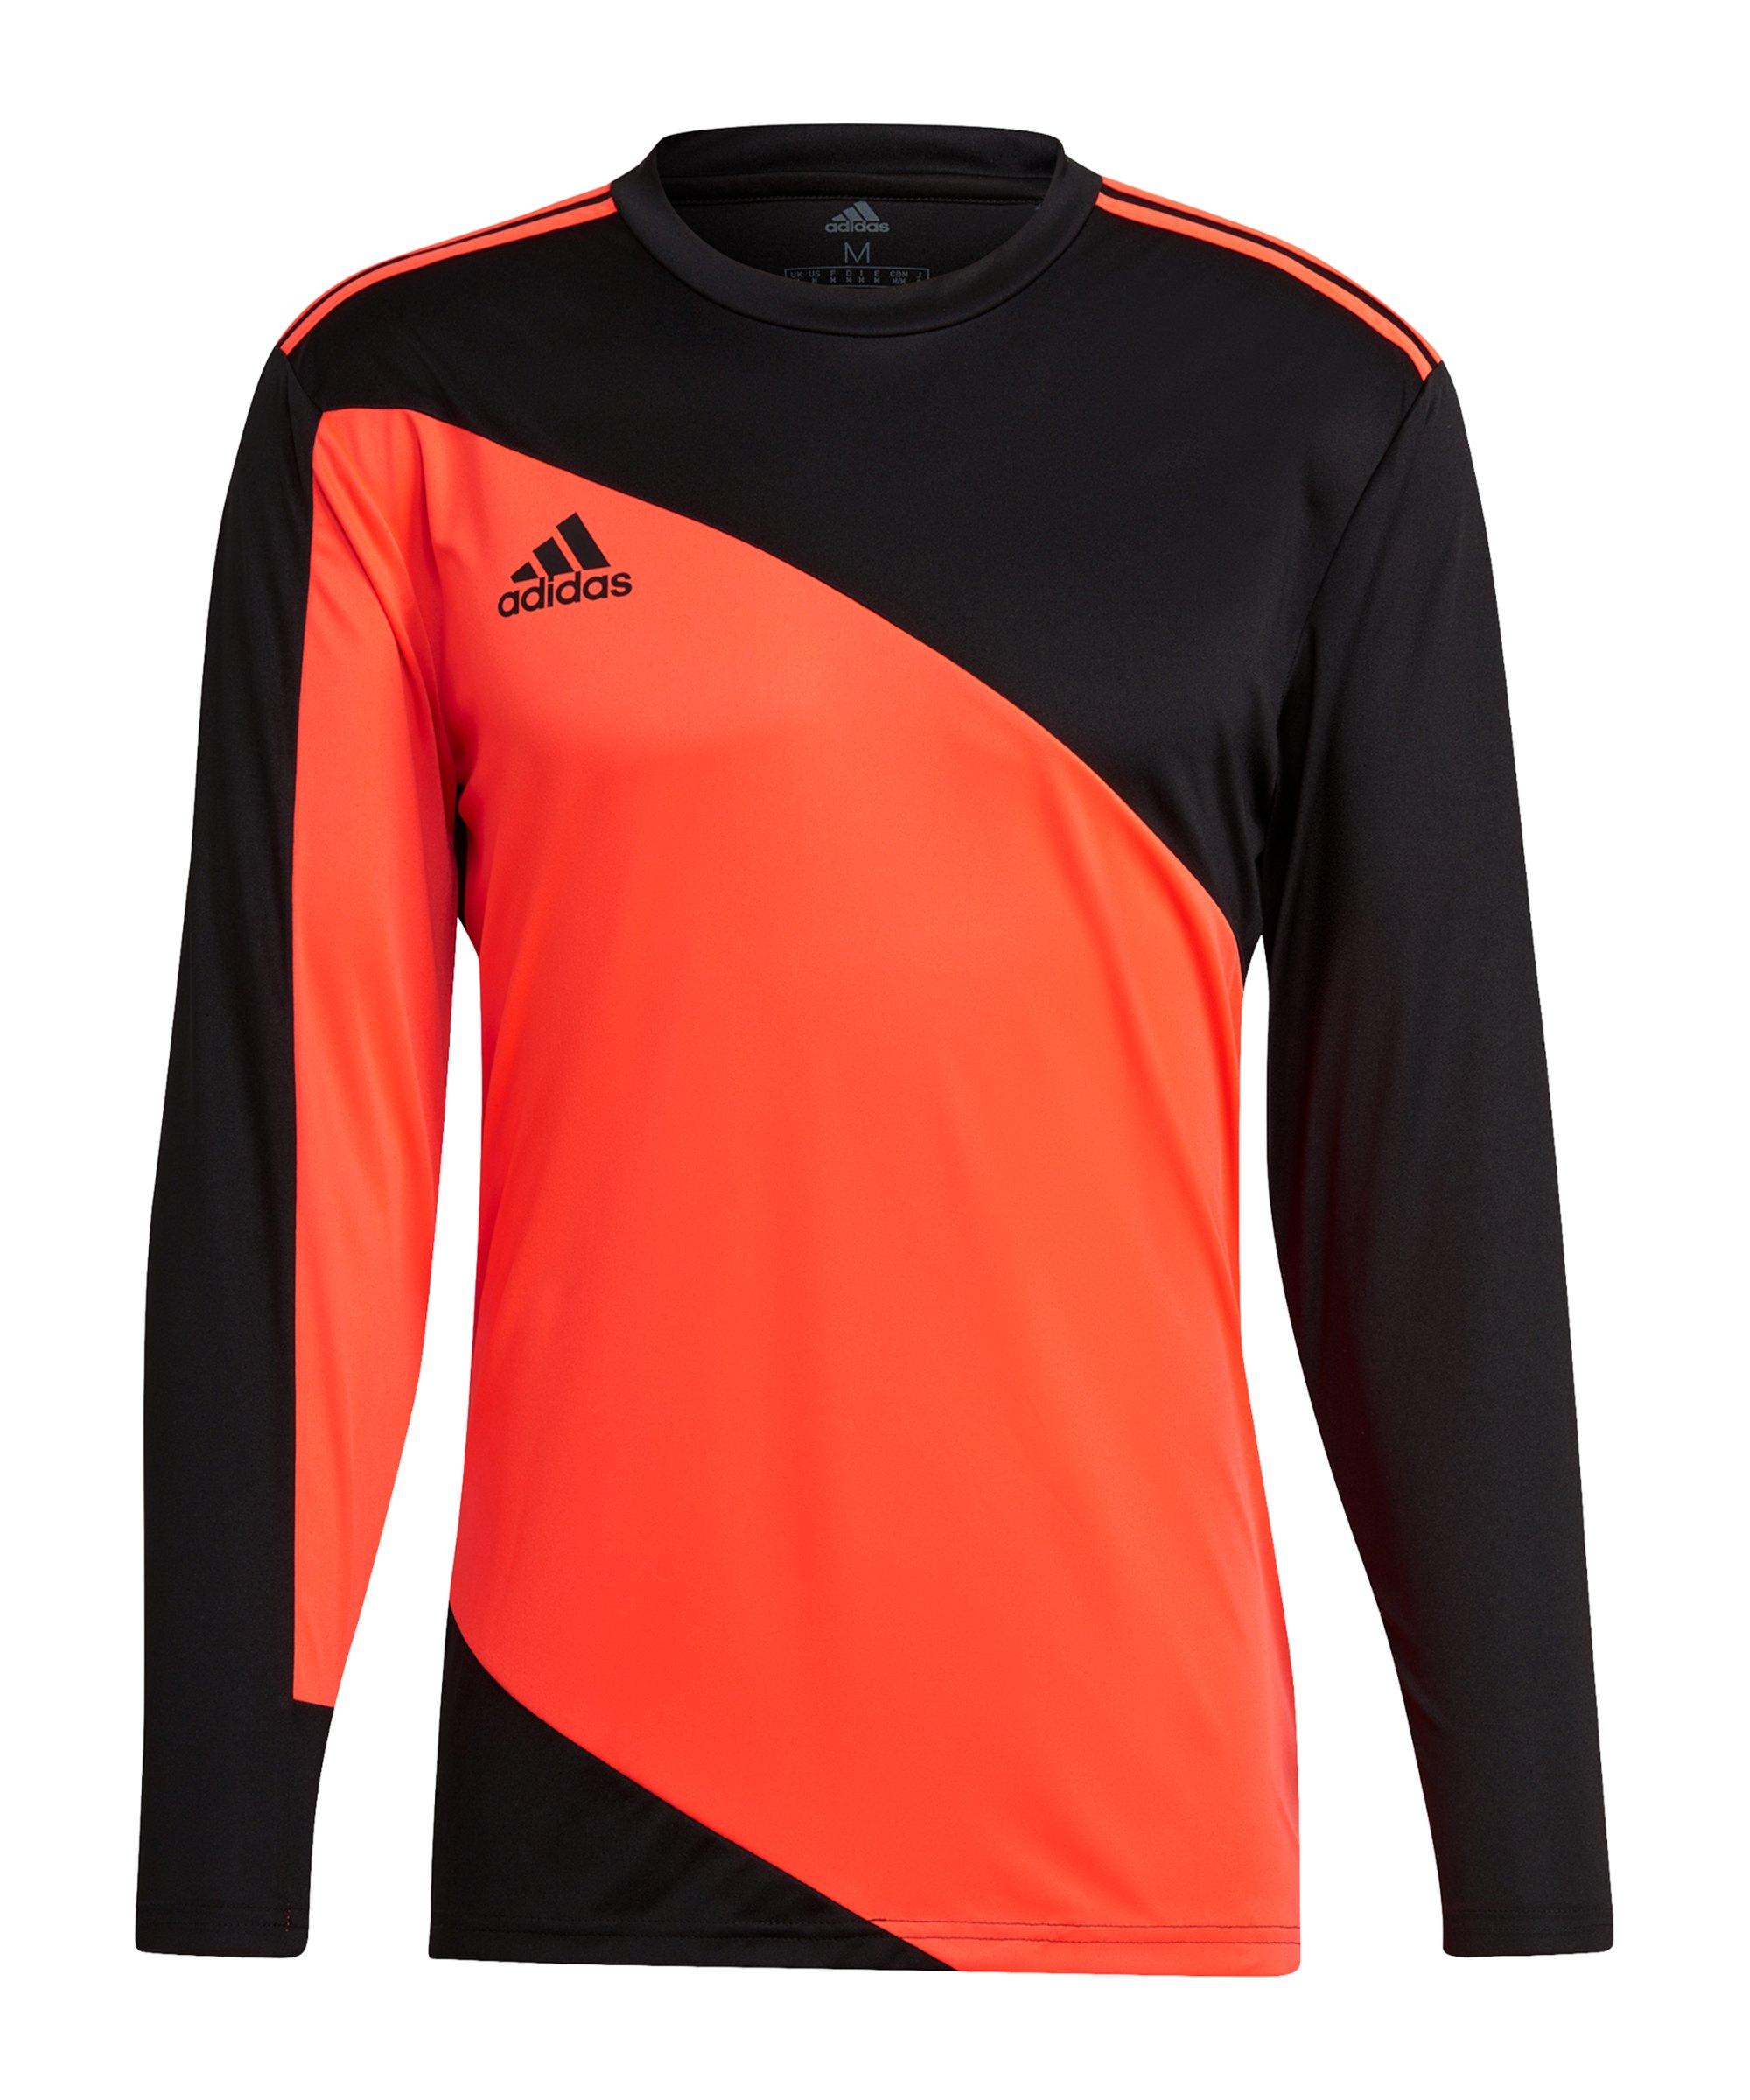 adidas Squadra 21 Torwarttrikot Schwarz Rot - orange